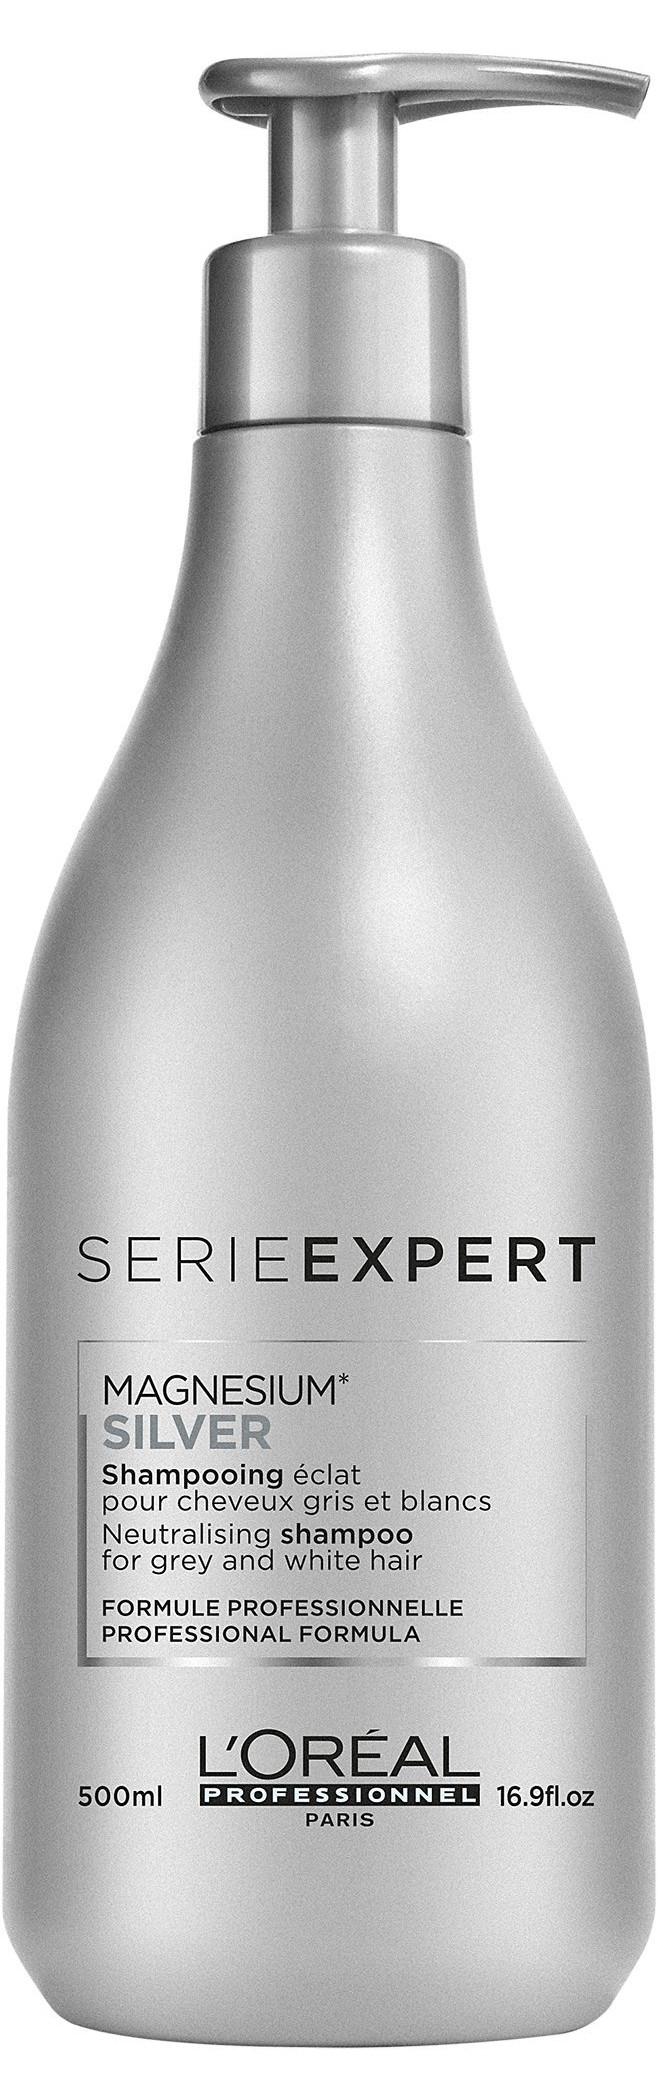 L'Oreal Serie Expert Magnesium Silver Shampoo (W) szampon do włosów 500ml